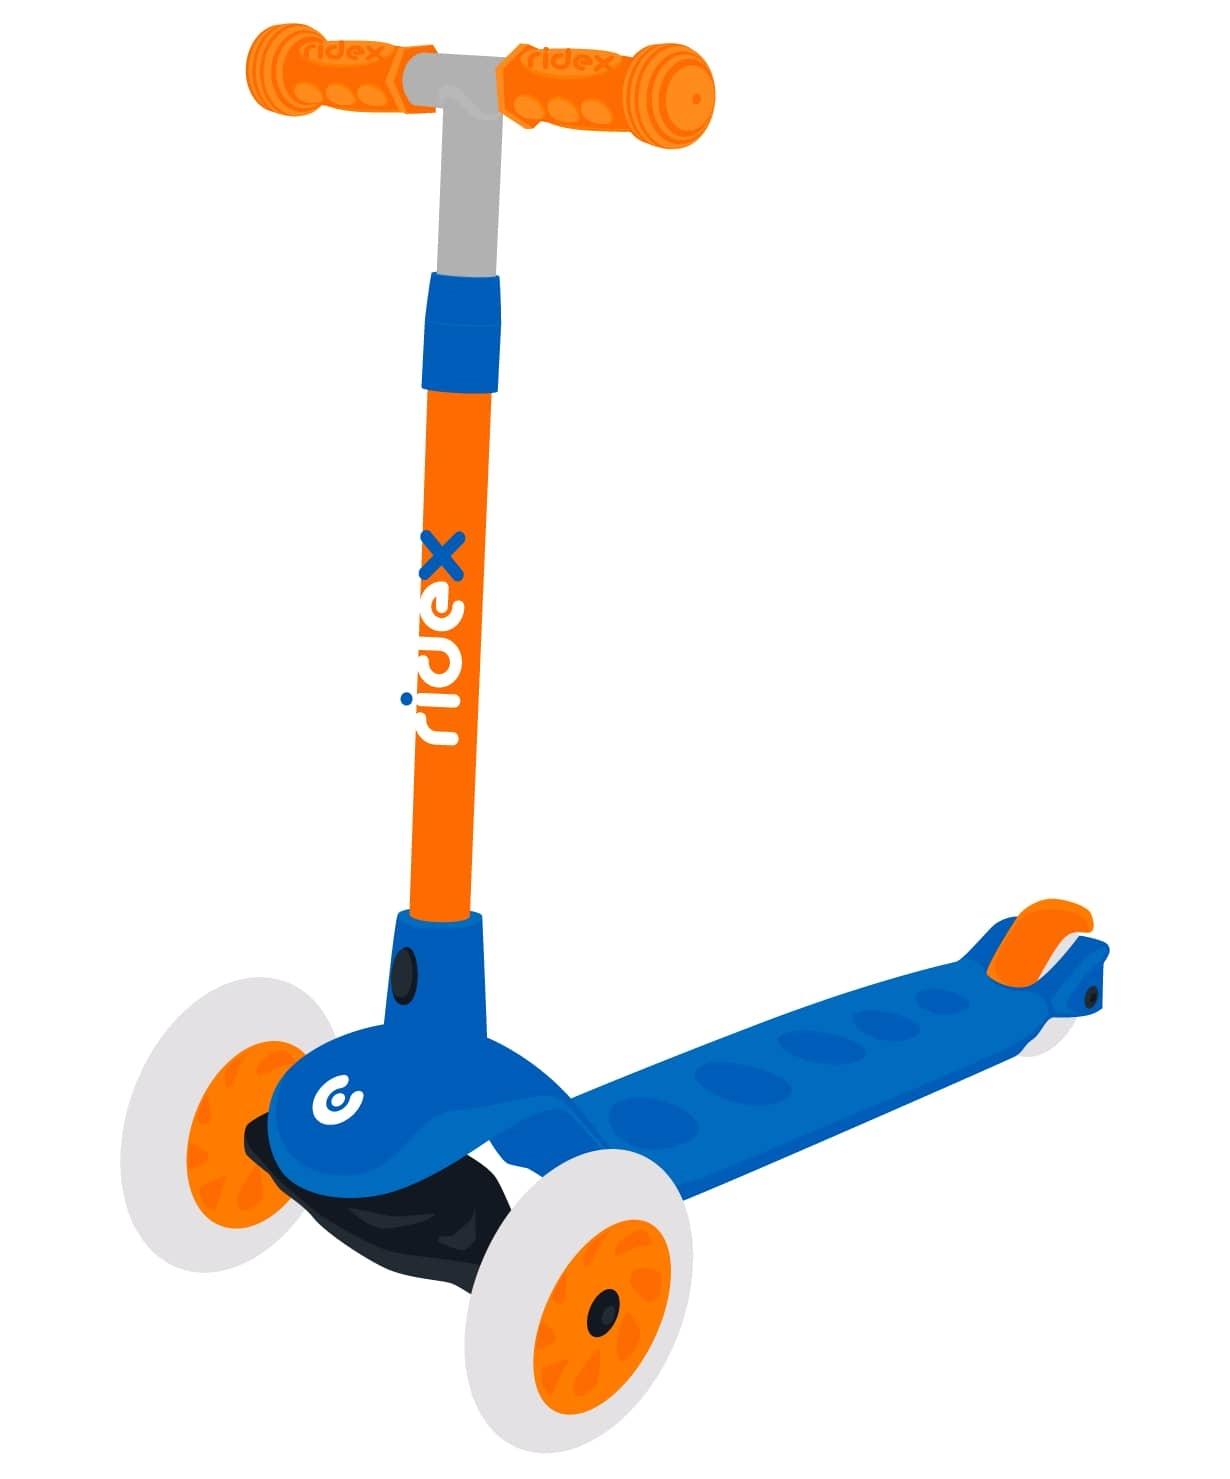 Самокат 3-колесный Hero, 120/80 мм, синий/оранжевый